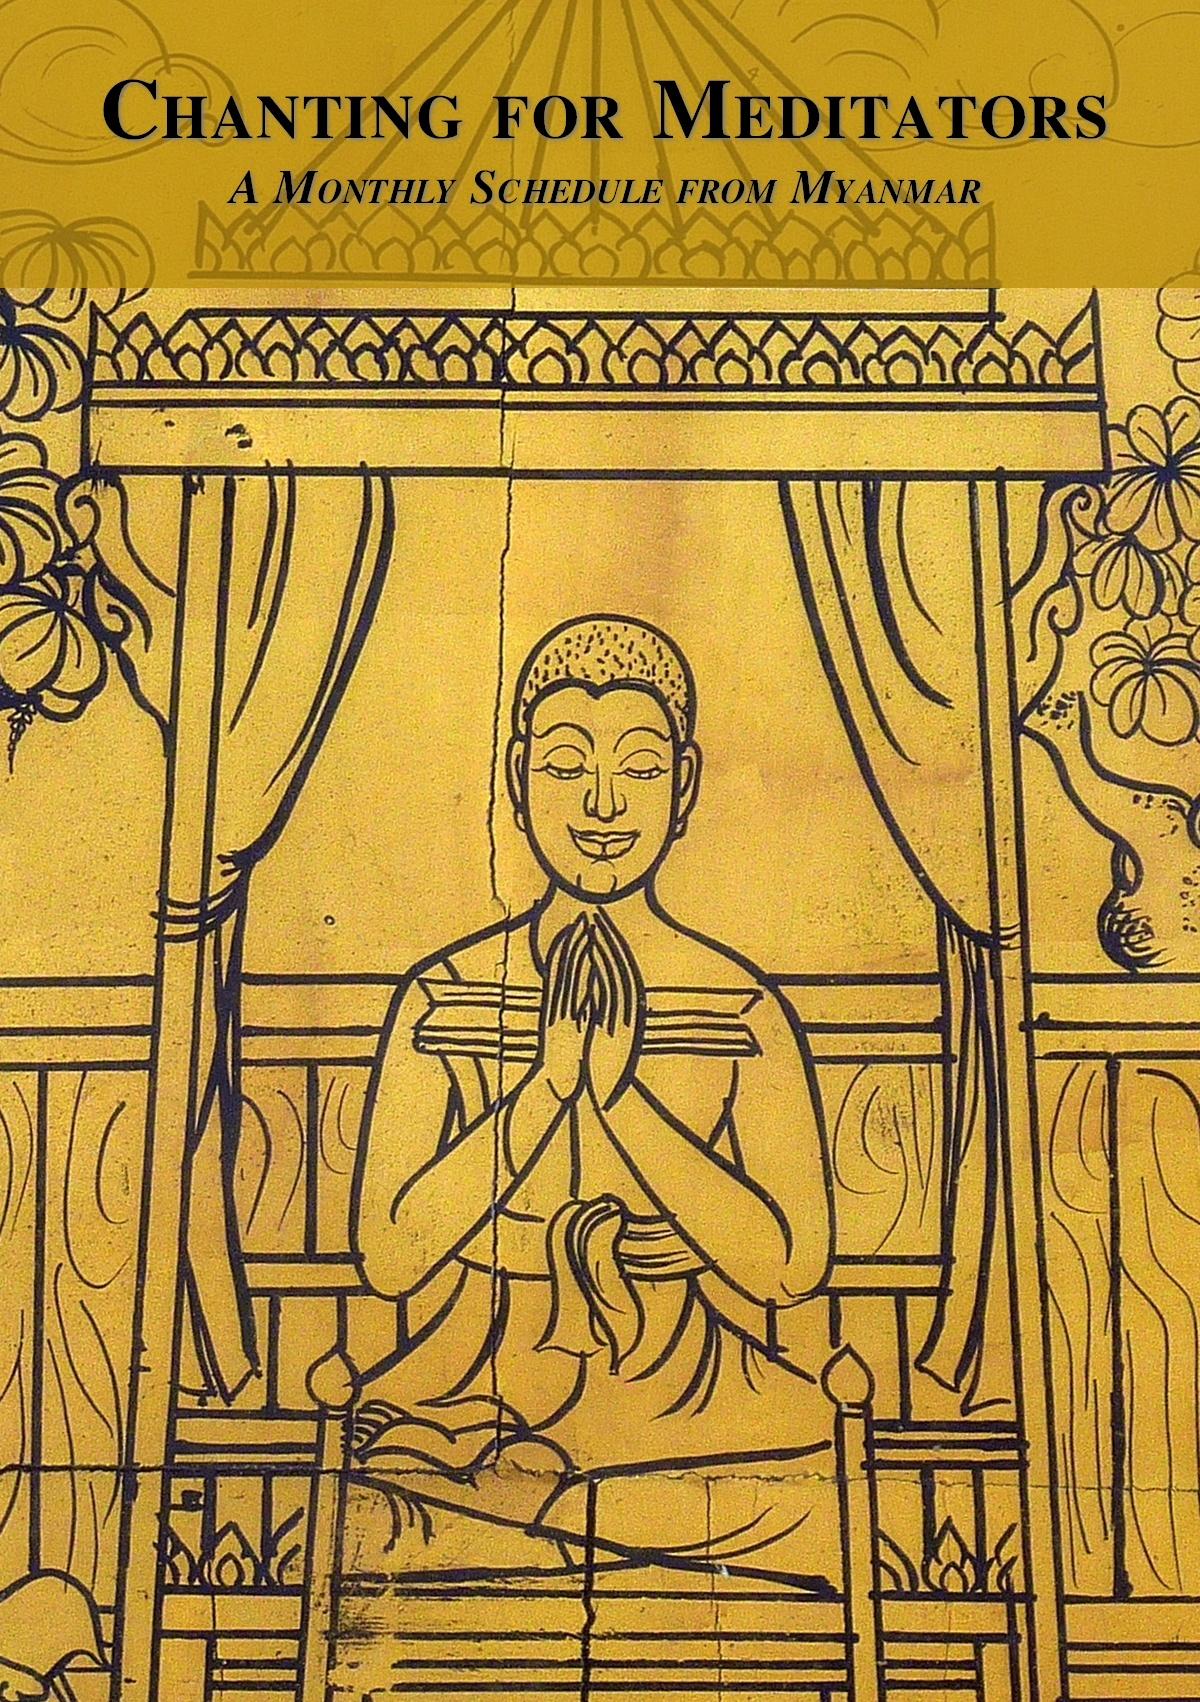 Chanting for Meditators